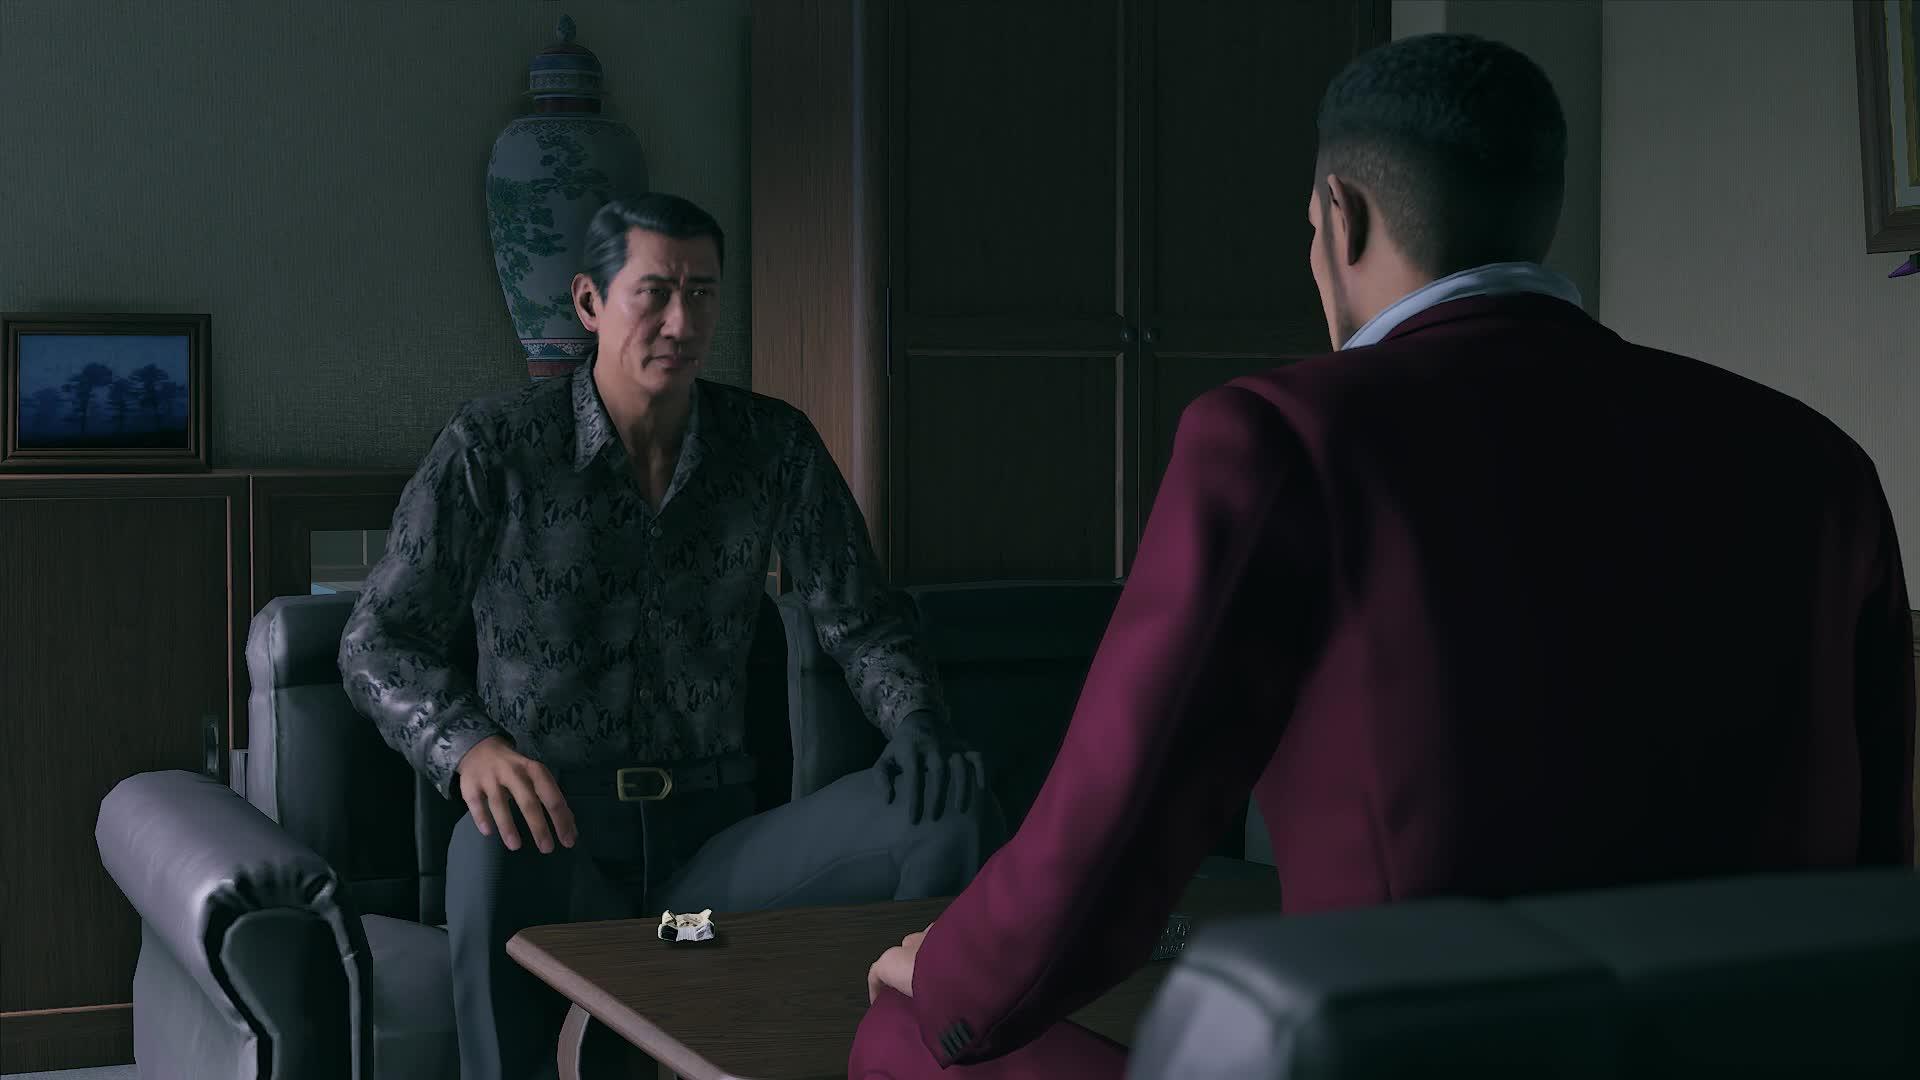 Yakuza: Like a Dragon - Announcement Trailer [HD] screen capture